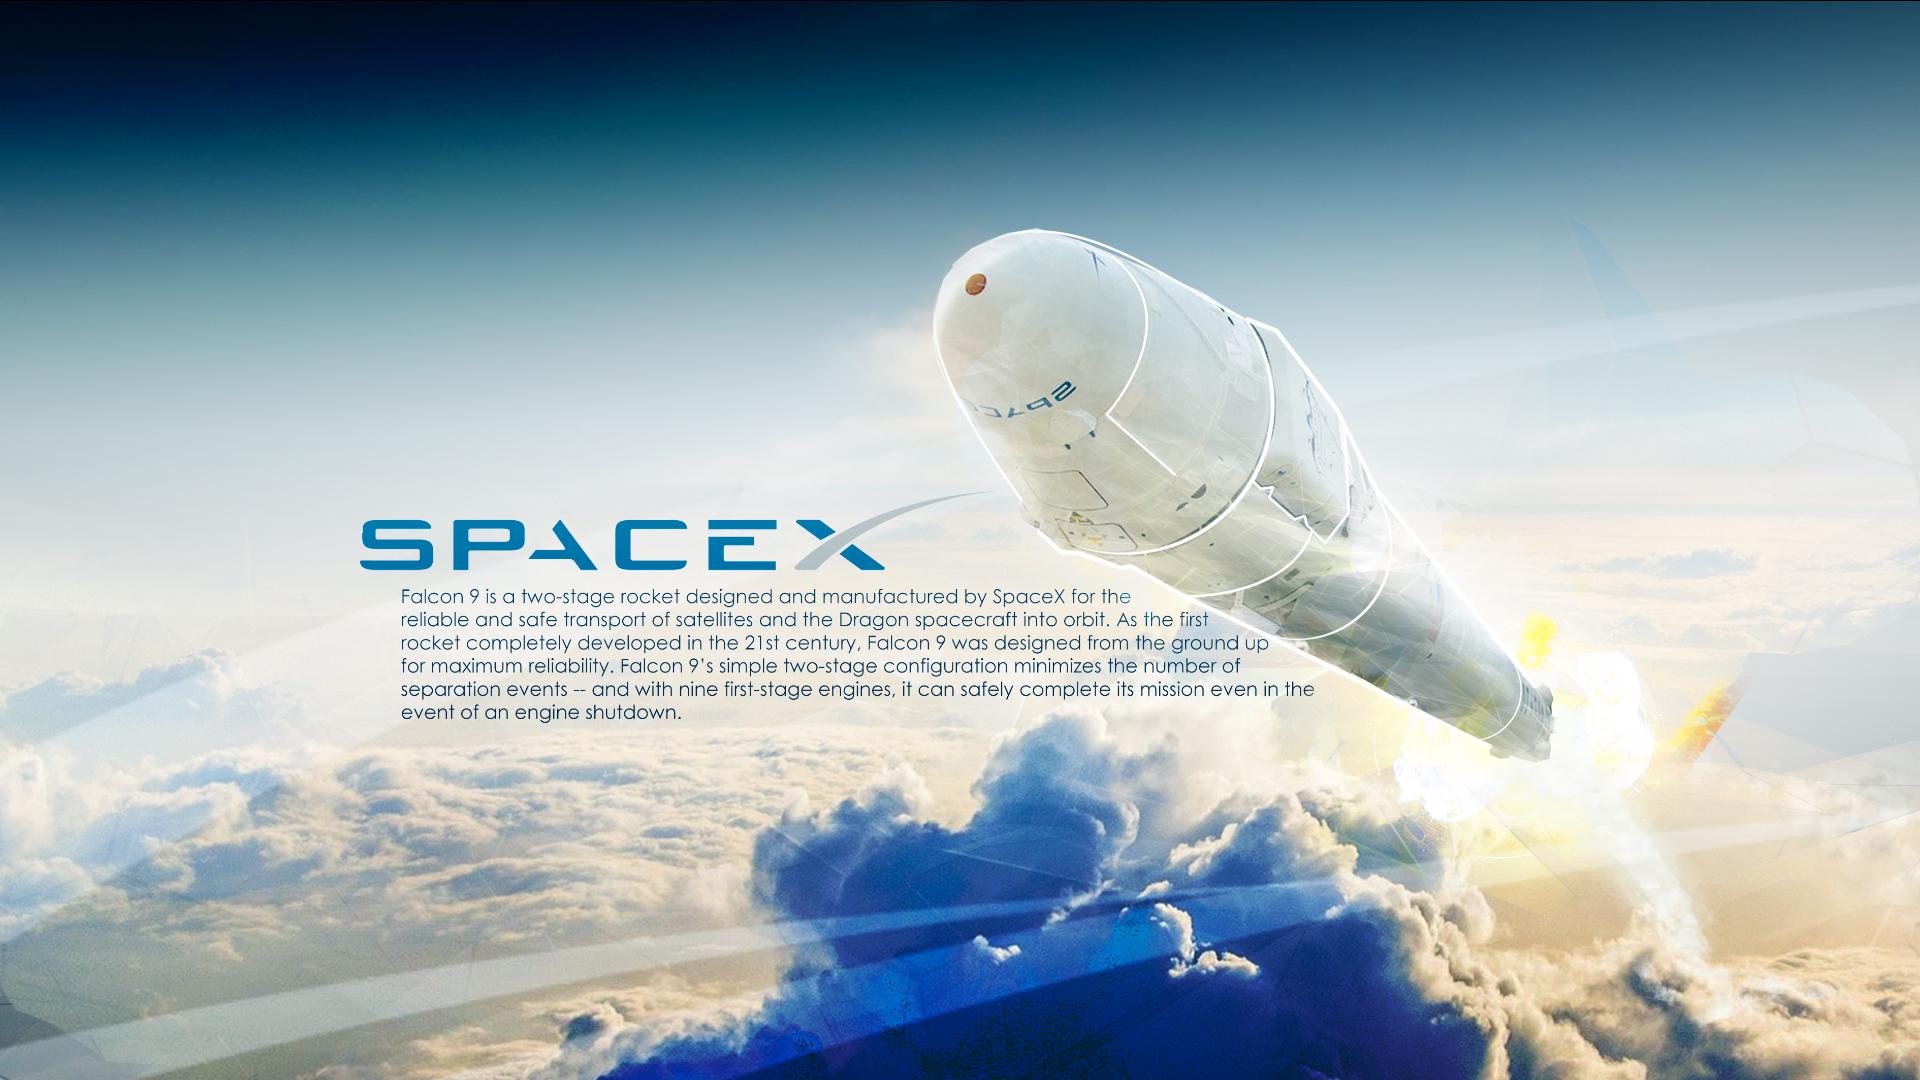 SpaceX Falcon 9 wallpaper by Klamek97 on DeviantArt